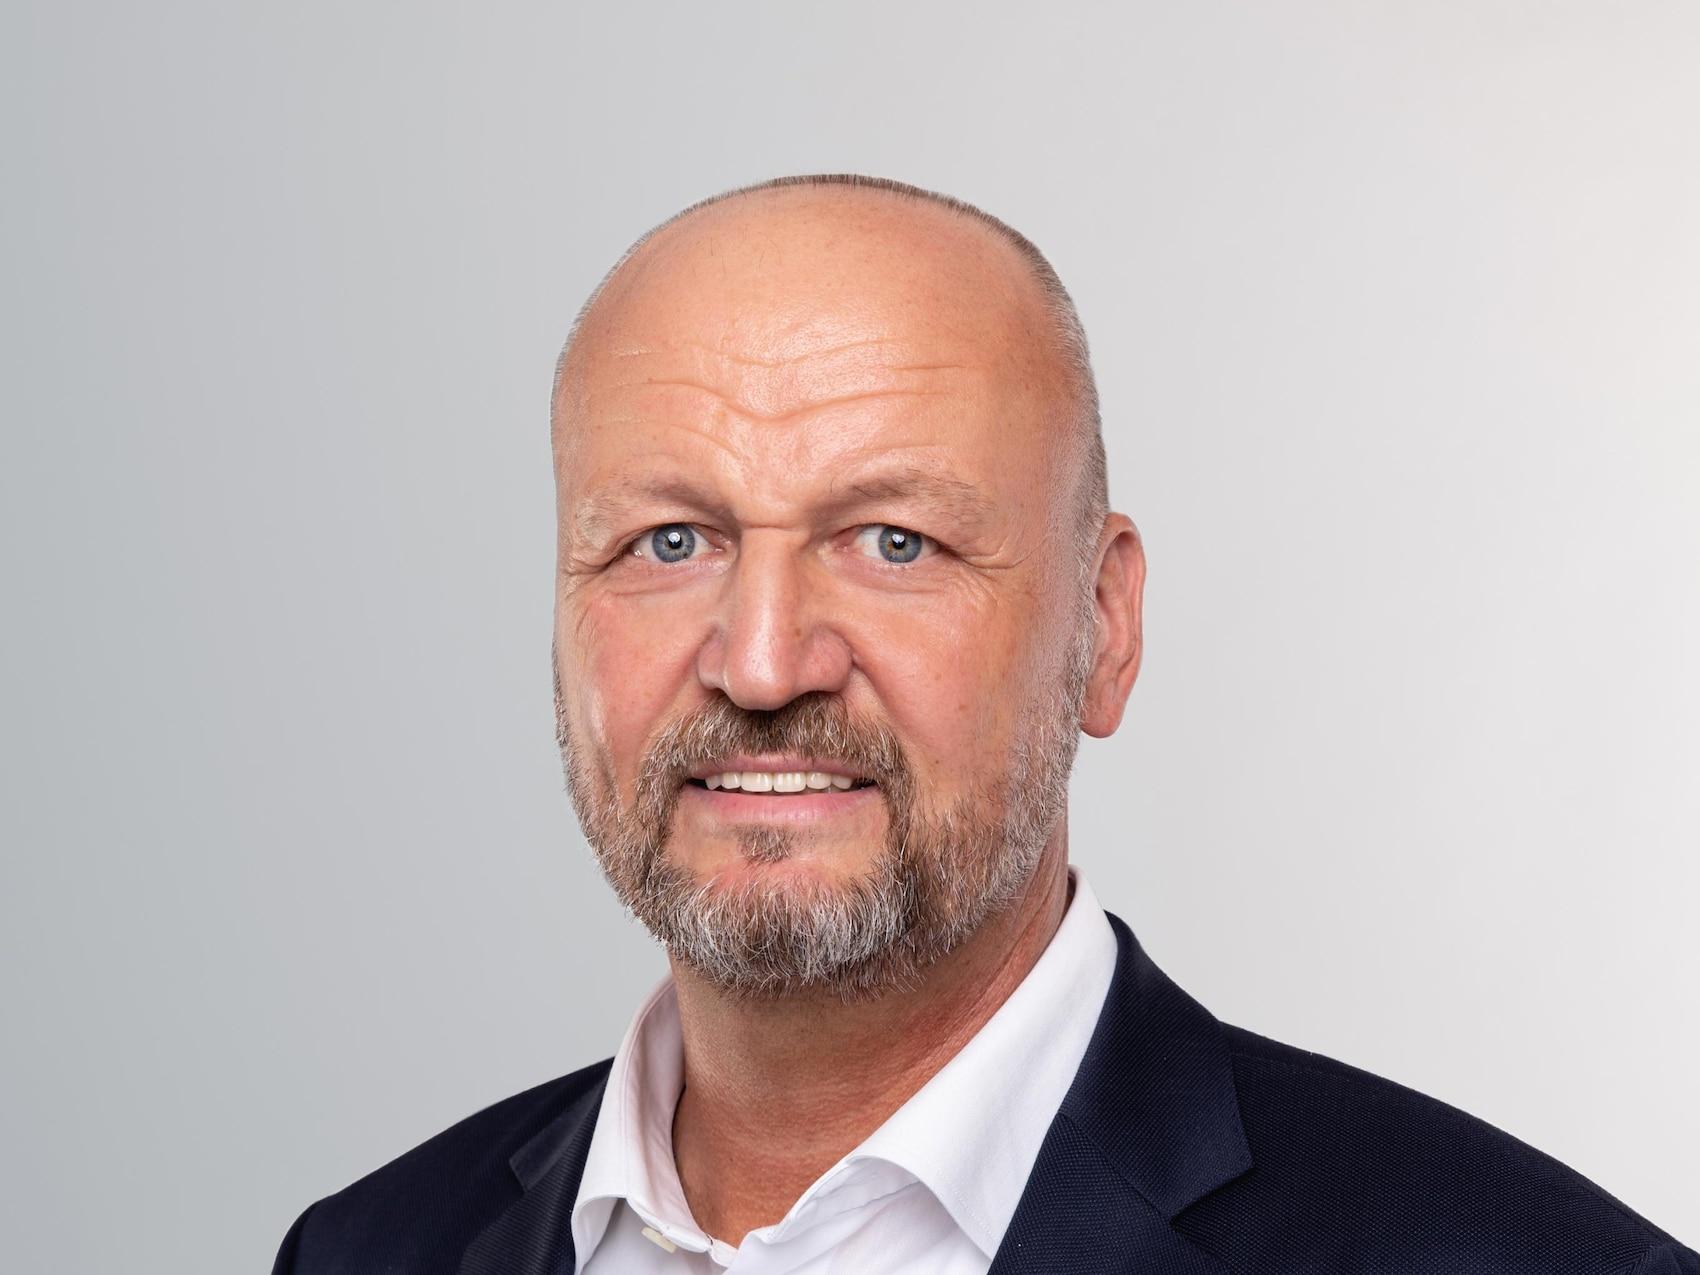 team-sc-freiburg-kaulfuß-michael